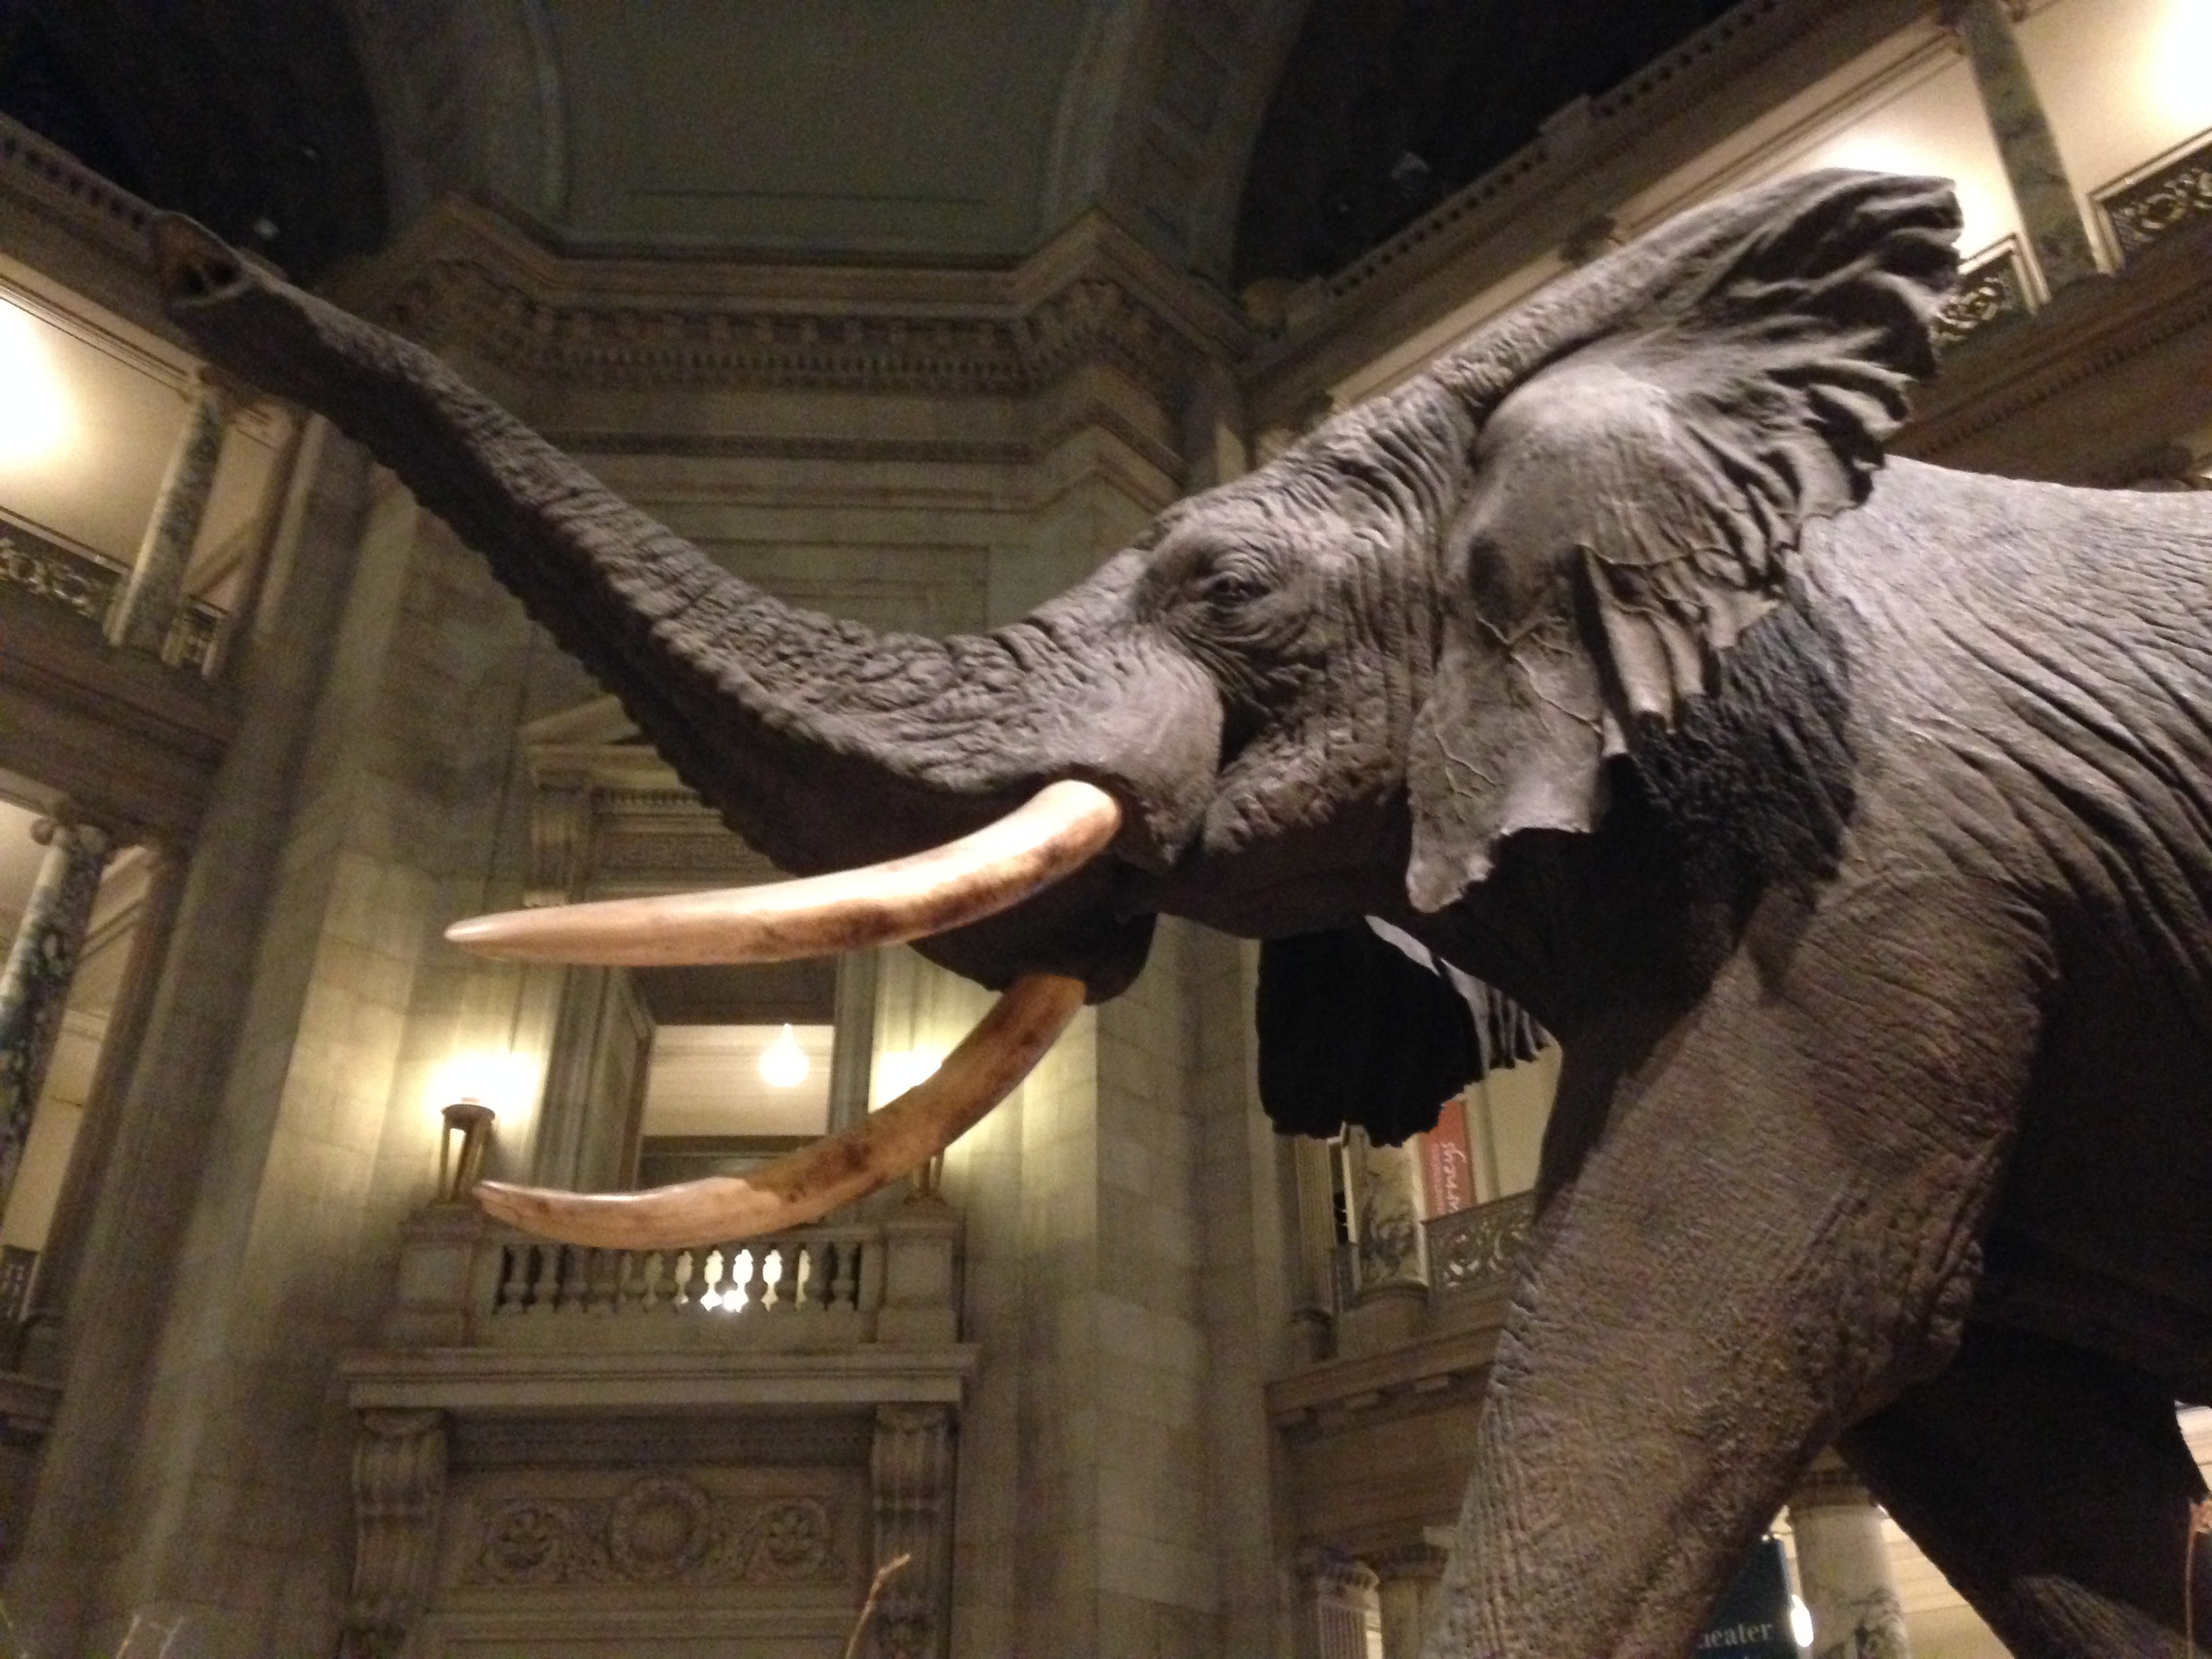 Smithsonian Sleepovers let kids get lost in history